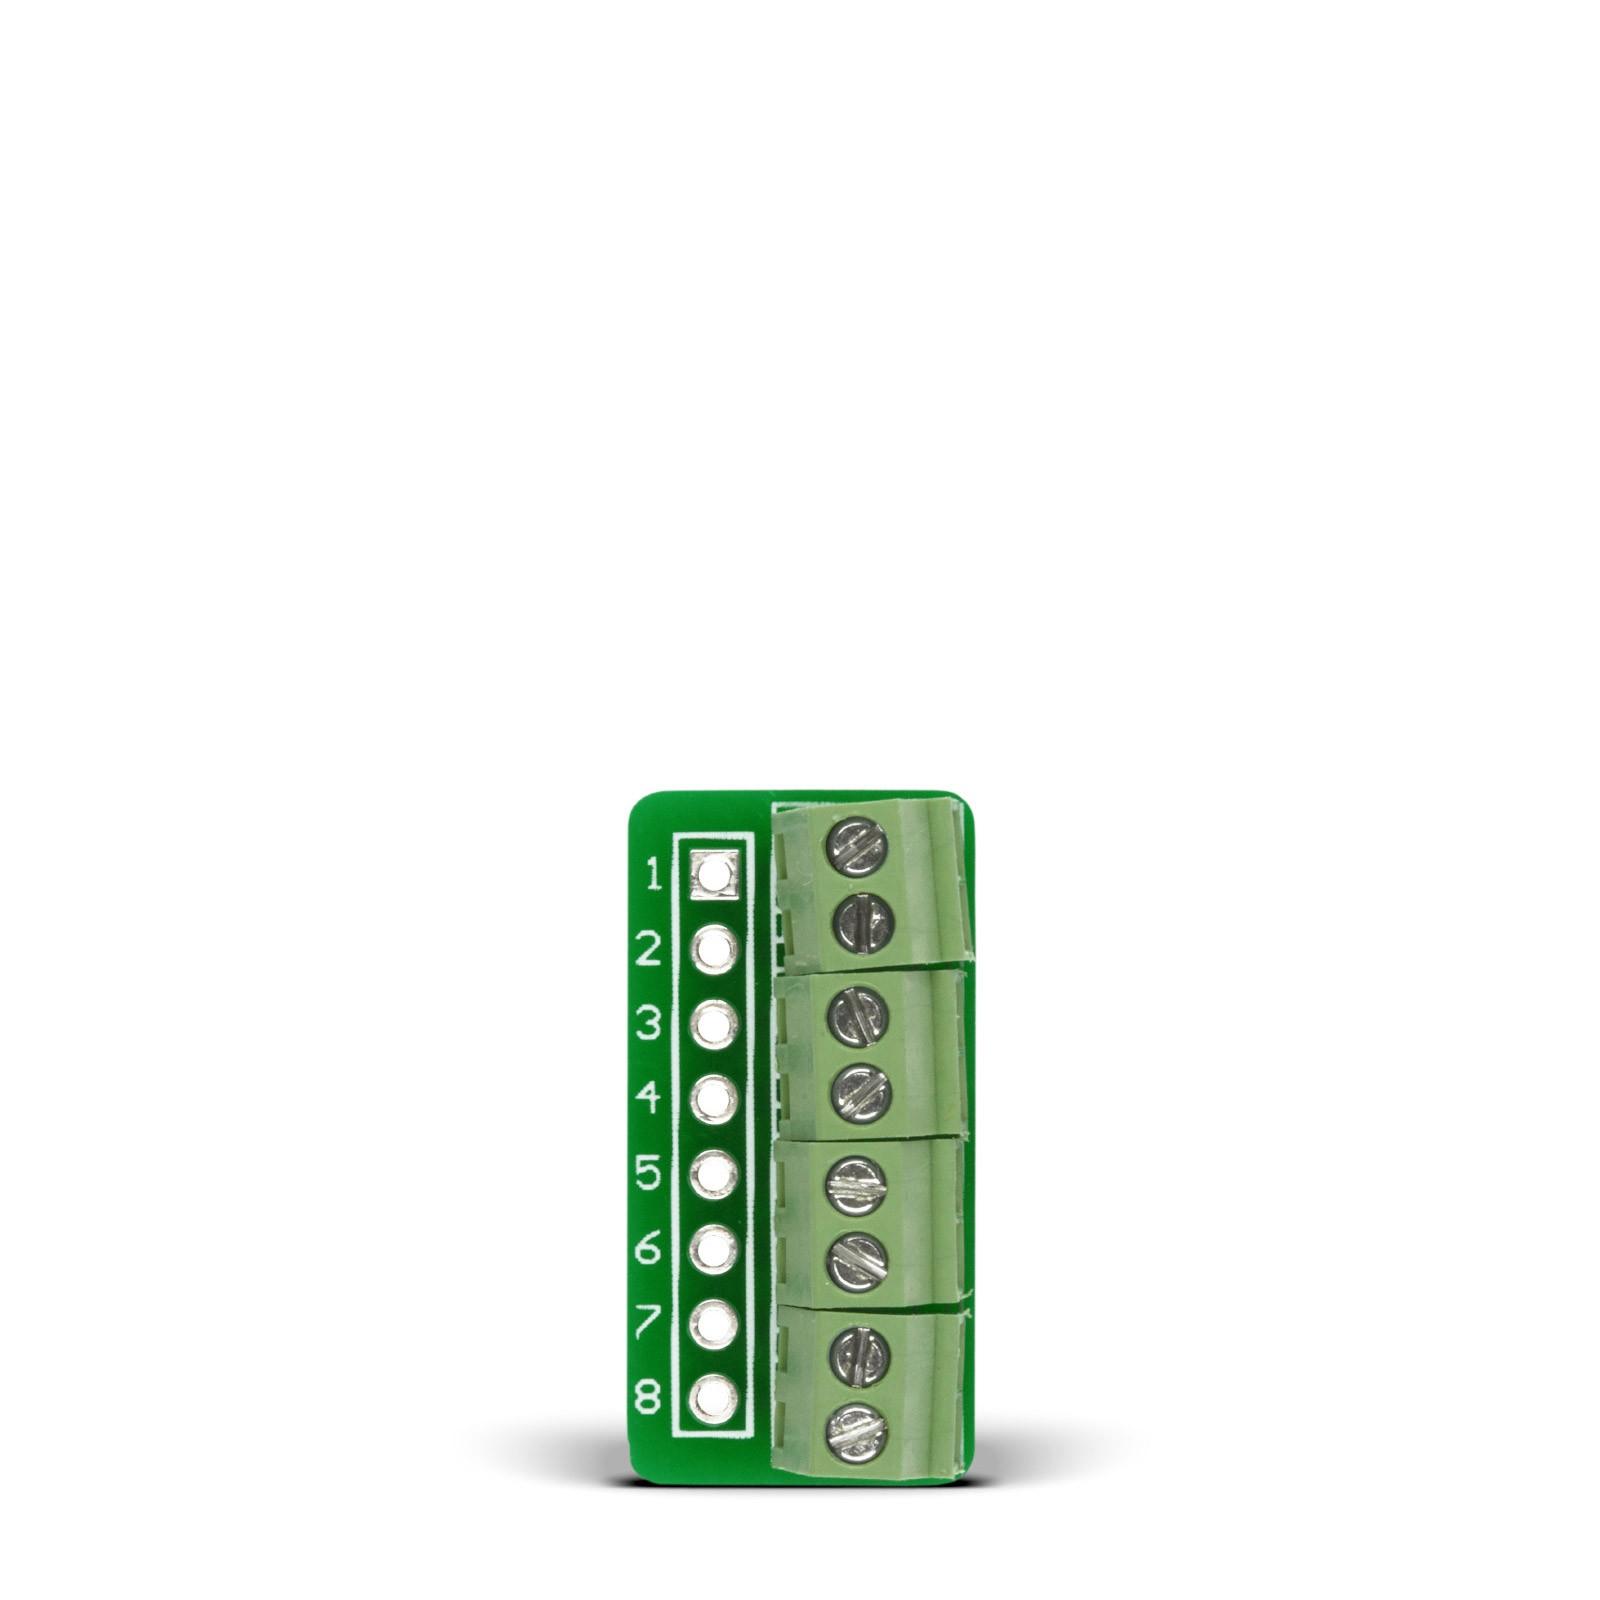 MikroElektronika - PROTO Connect Boards - Prototype Tool